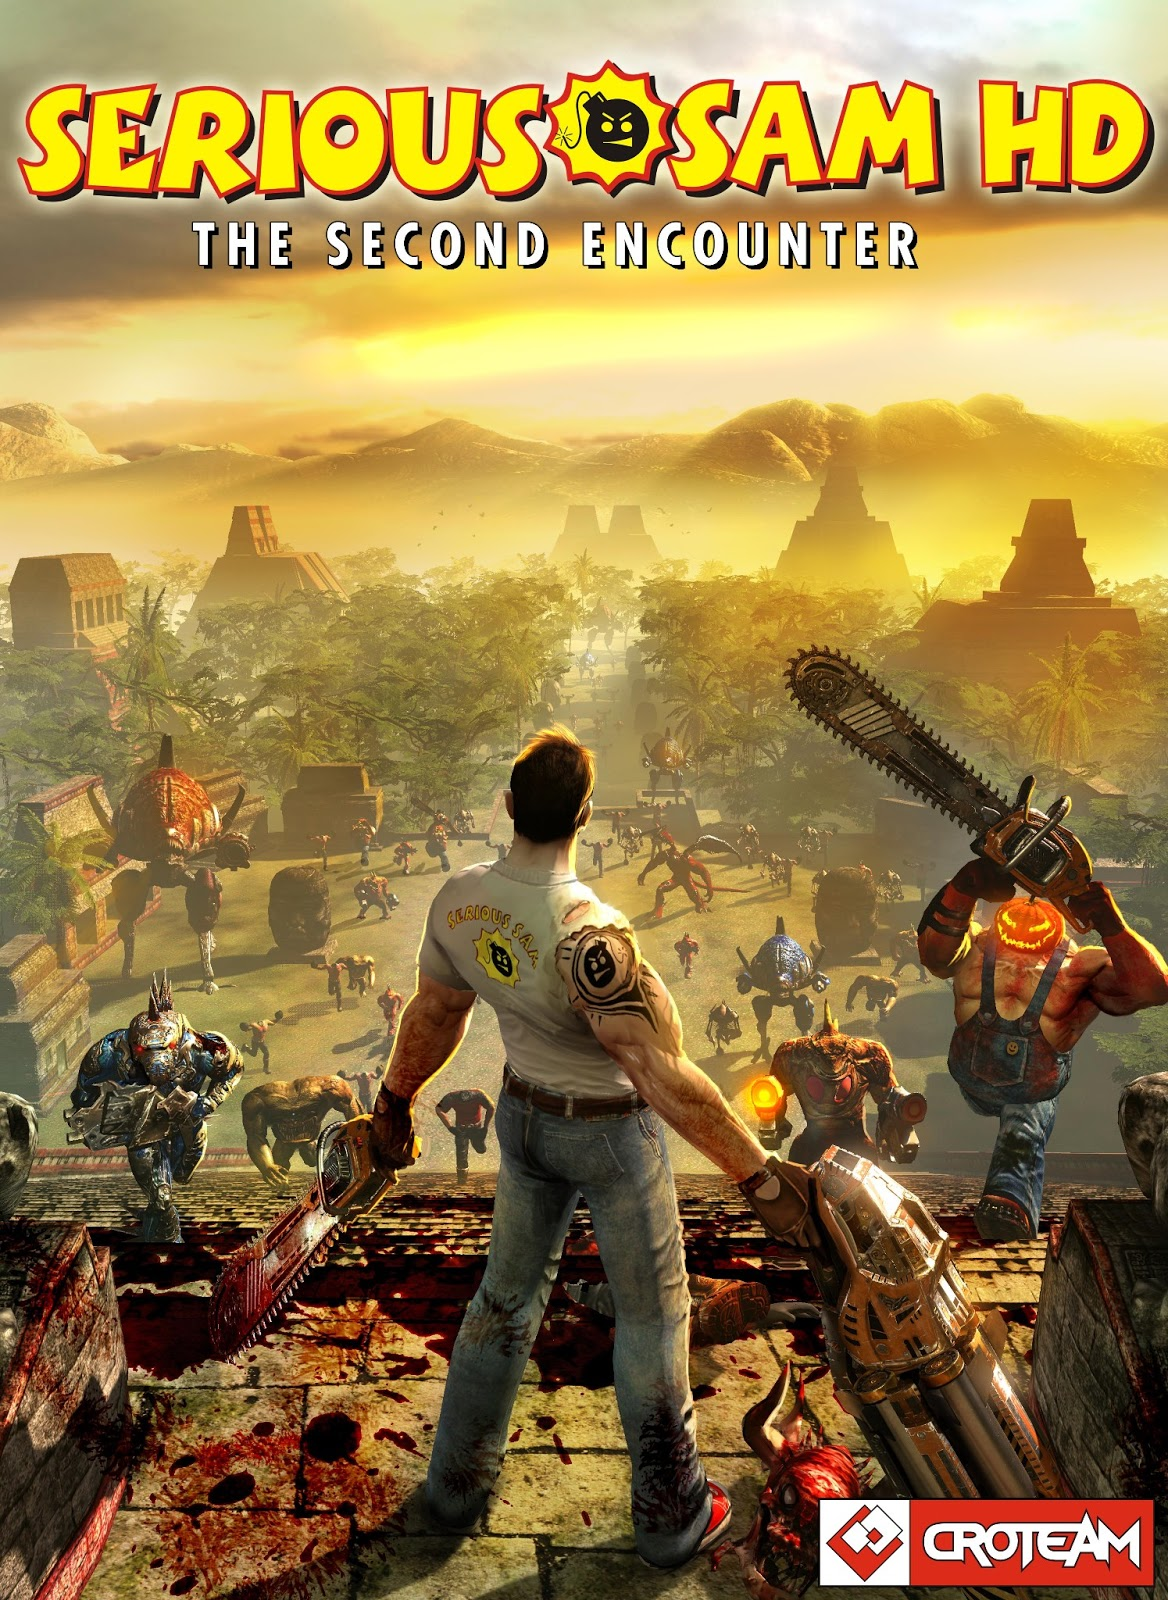 Versión en HD de Serious Sam The Second Encounter, lanzado en febrero